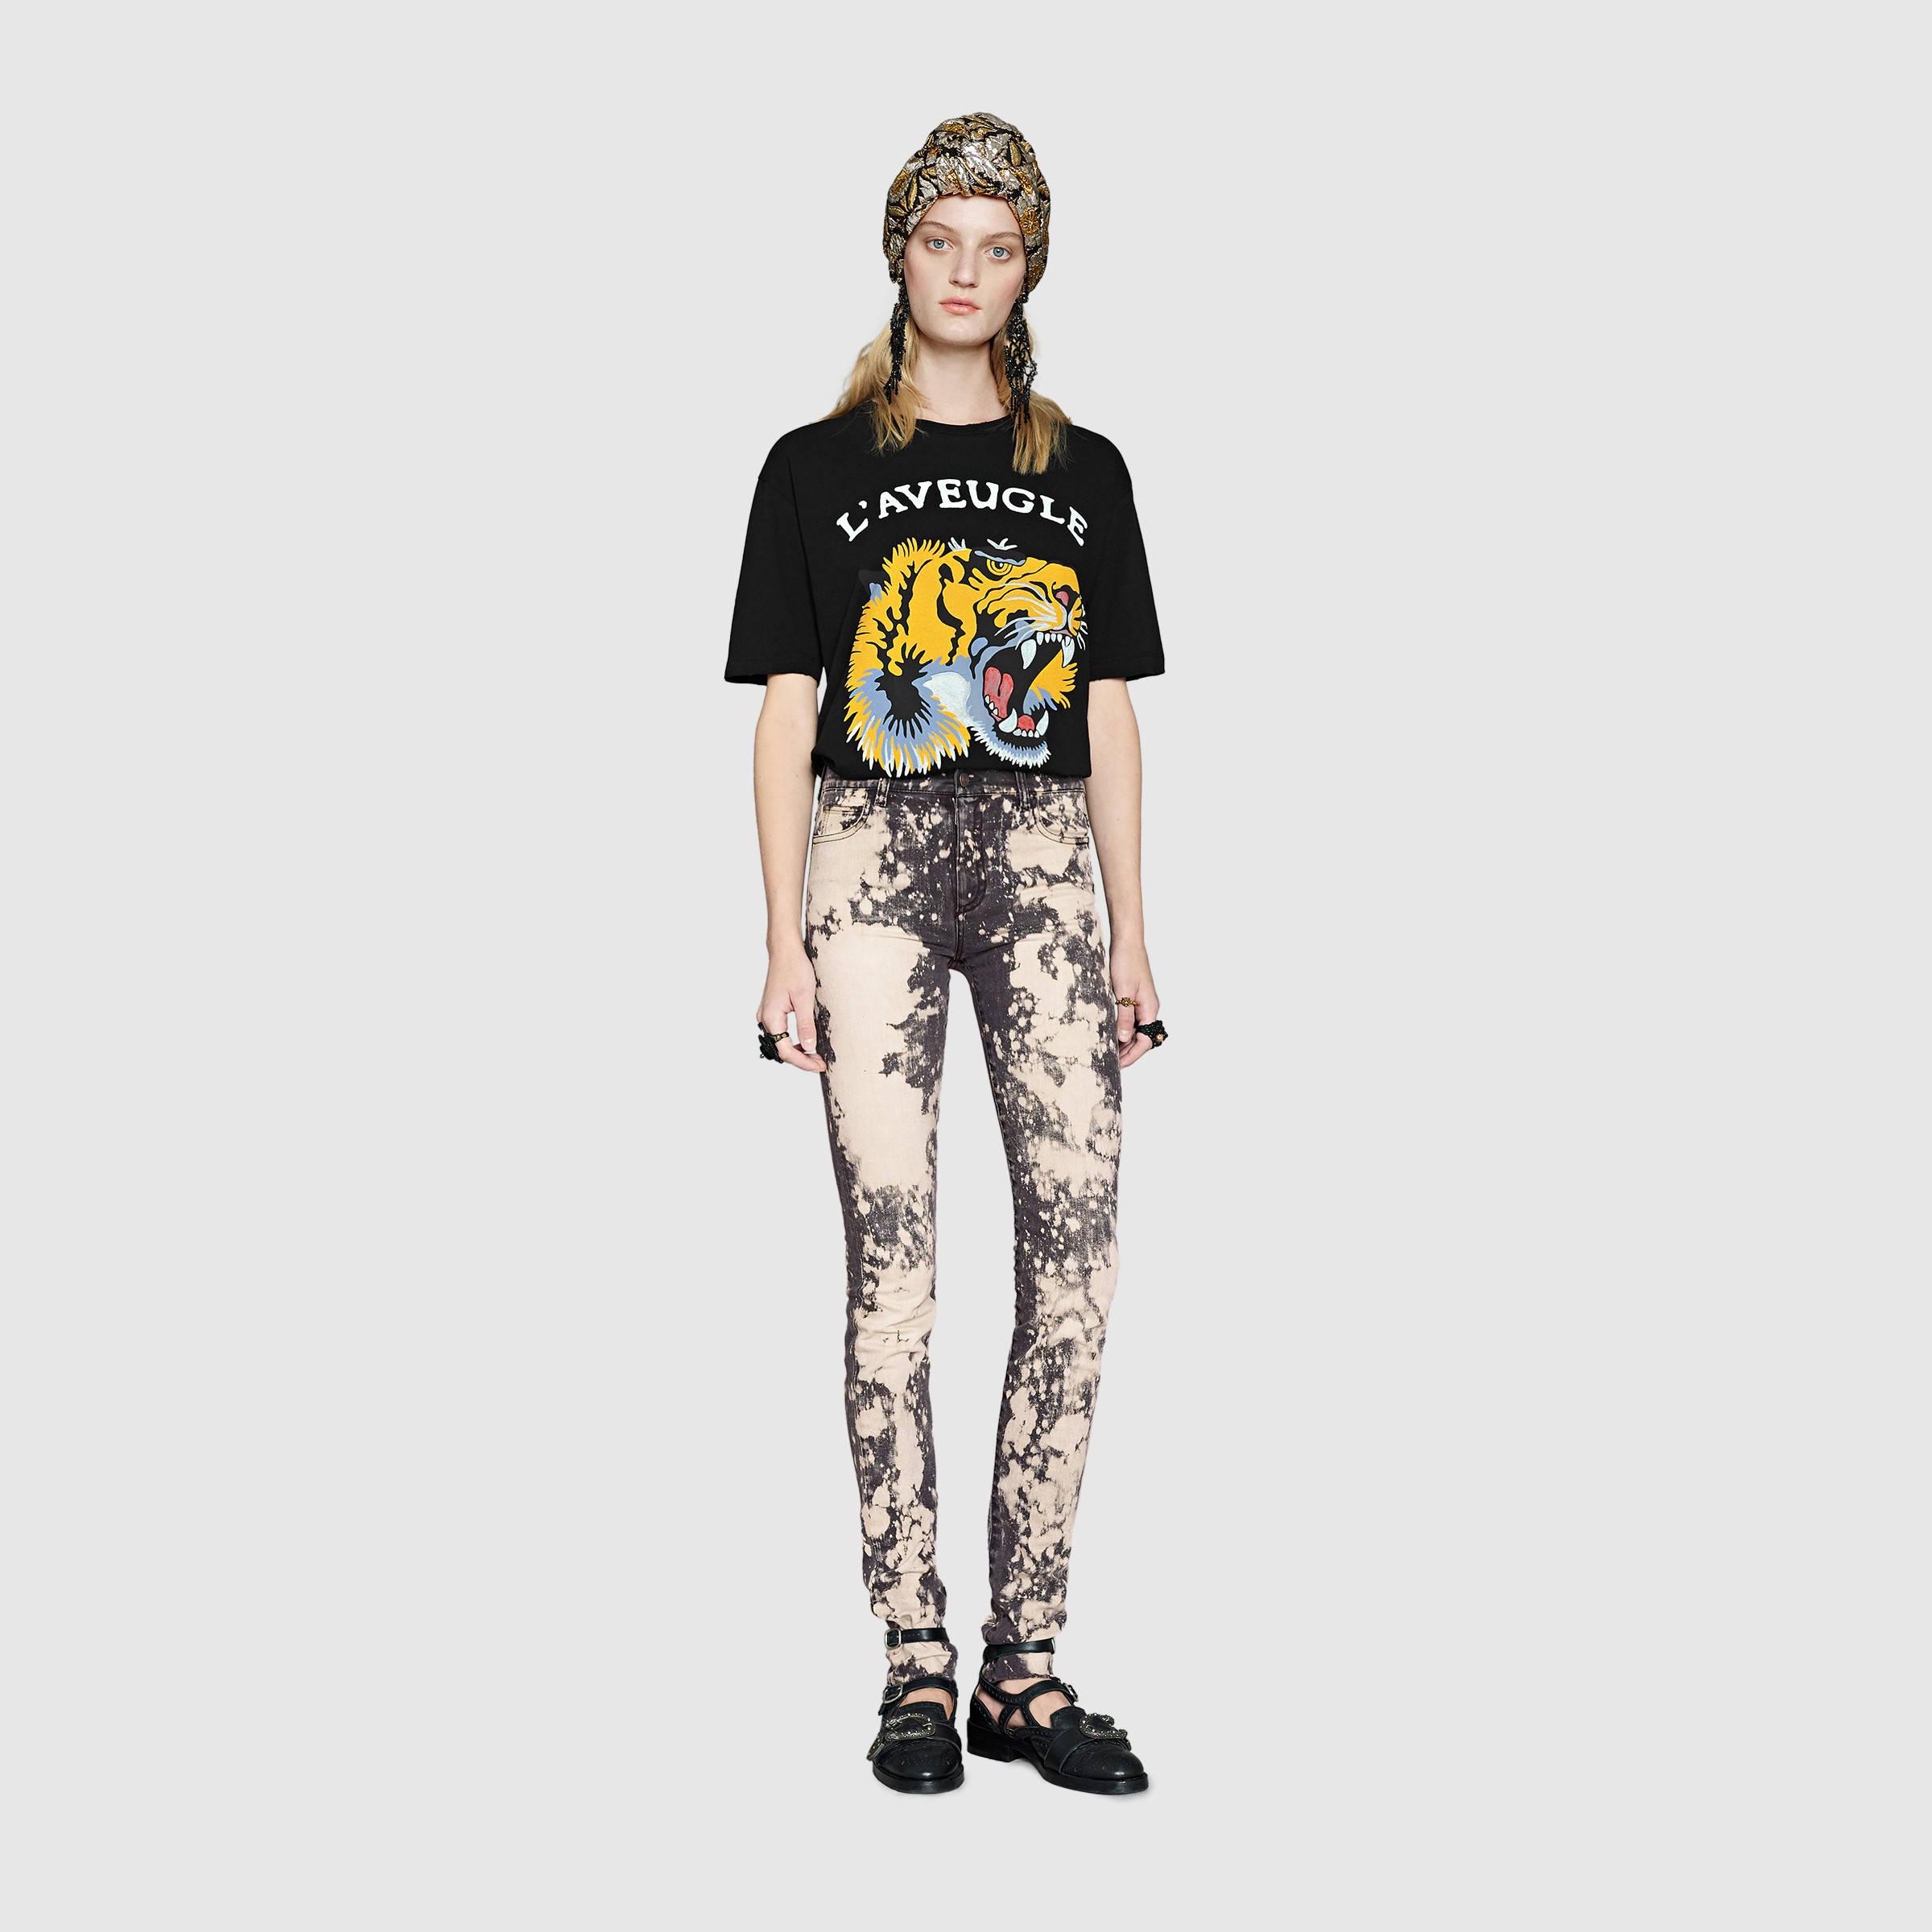 435101_X5L87_1061_002_100_0000_Light-Tiger-print-cotton-t-shirt